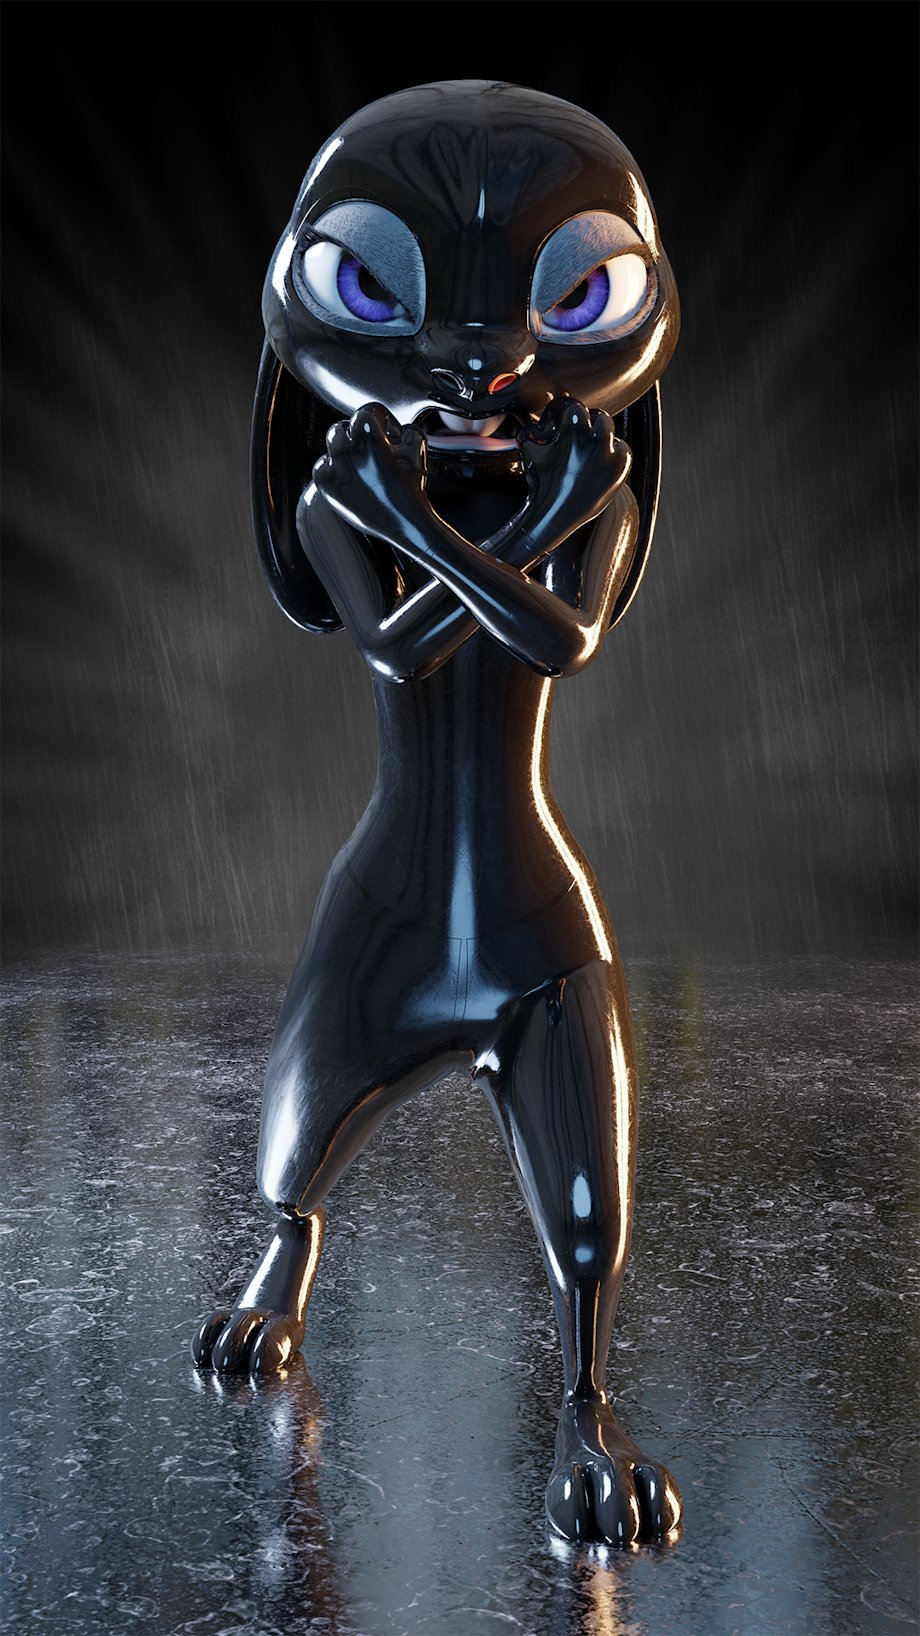 3D Latex Bondage movim – tag – #latex